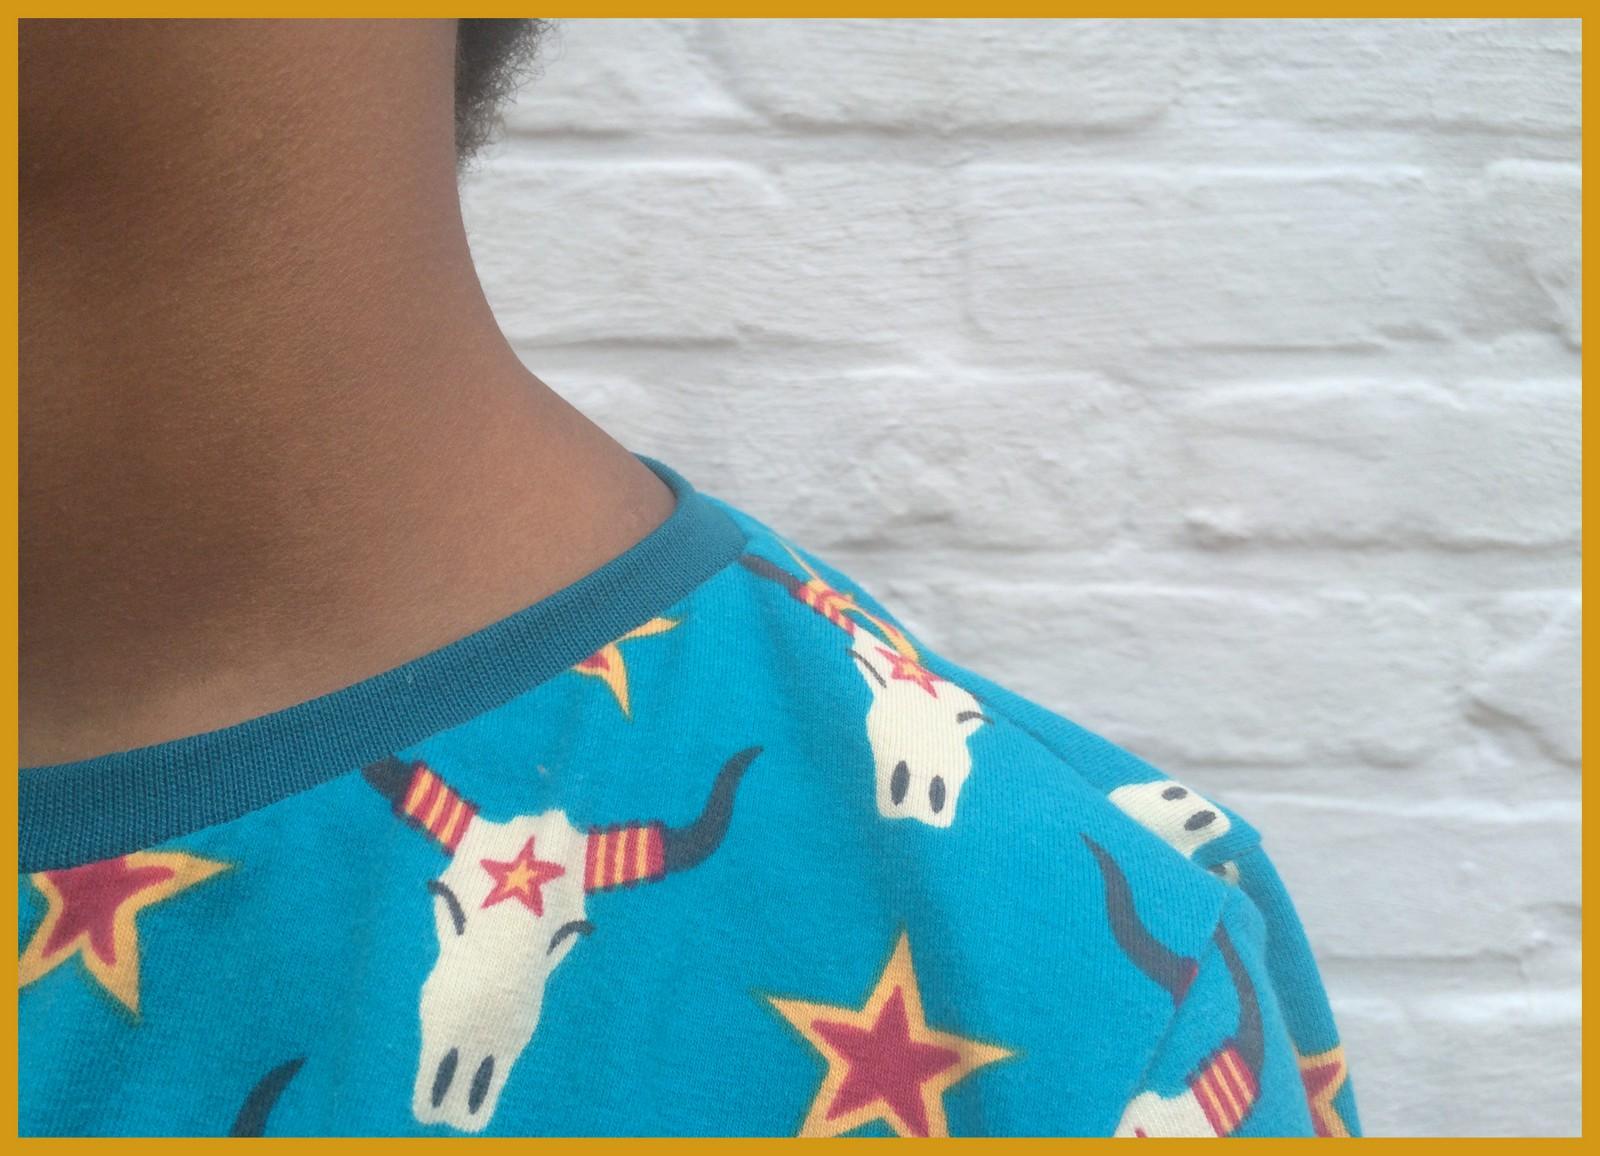 lillestof pyjama (close-up1) - bovenstuk billie zonen 09